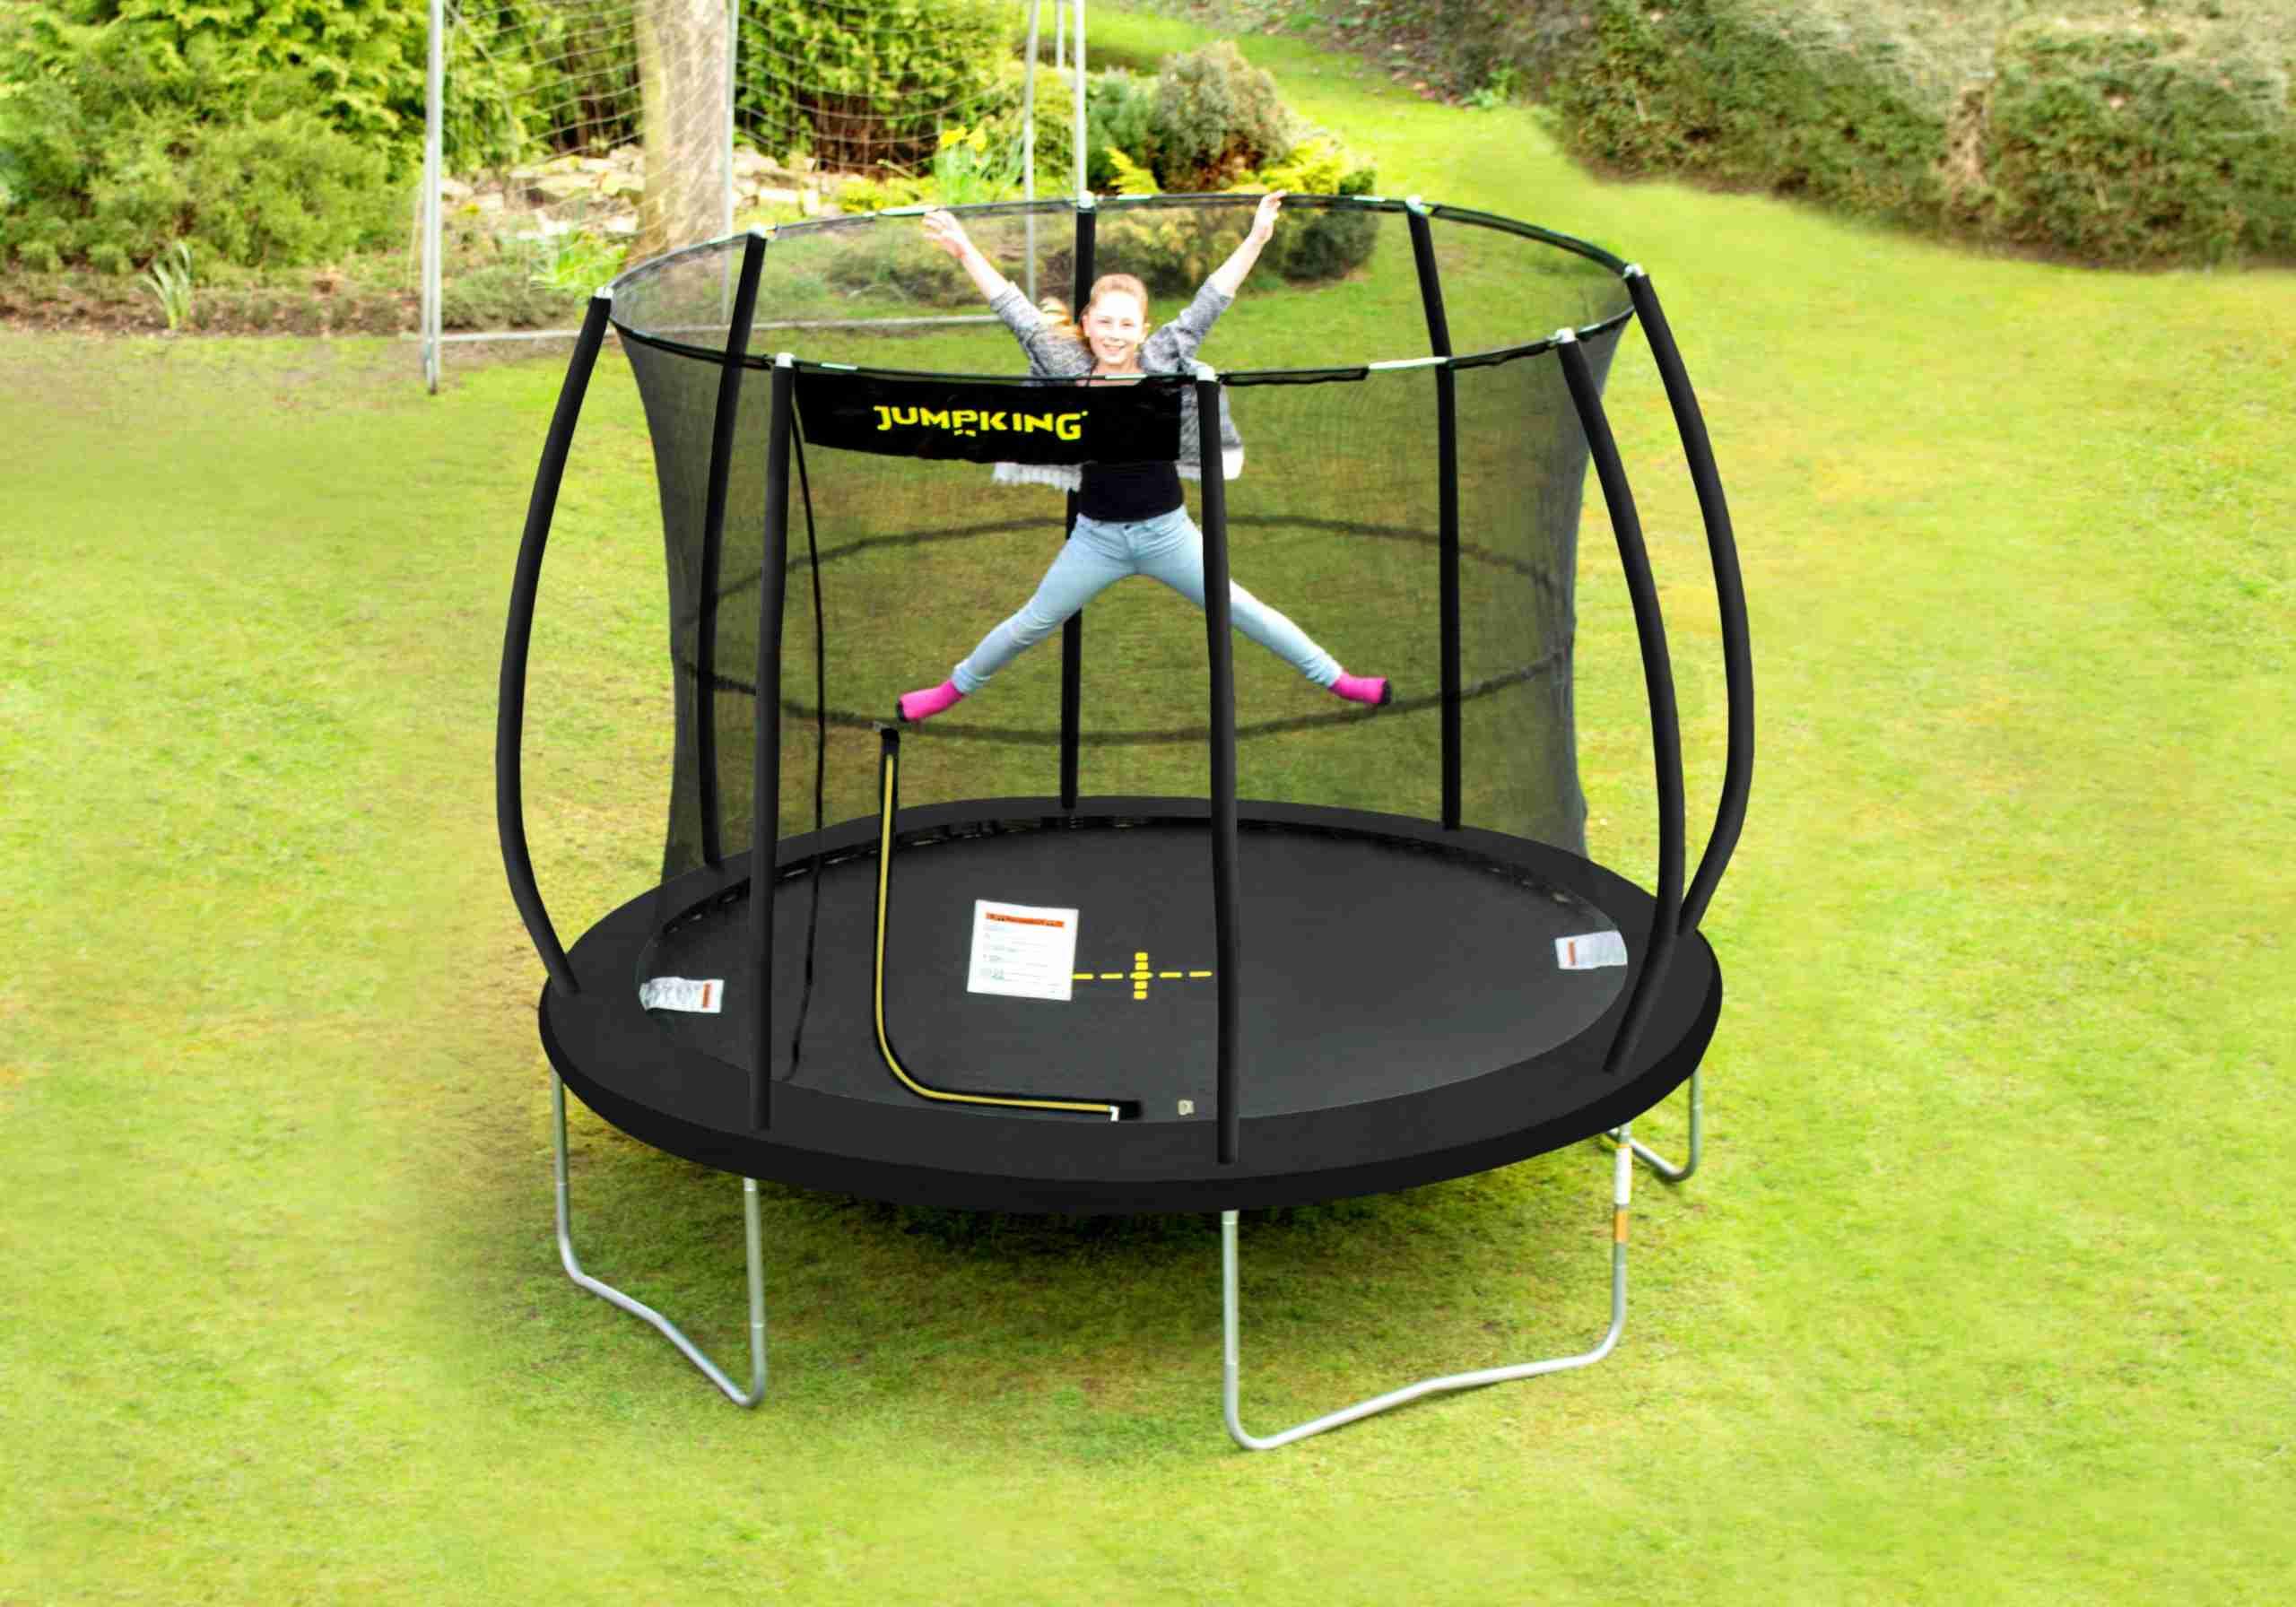 tappeto elastico jumpking nero